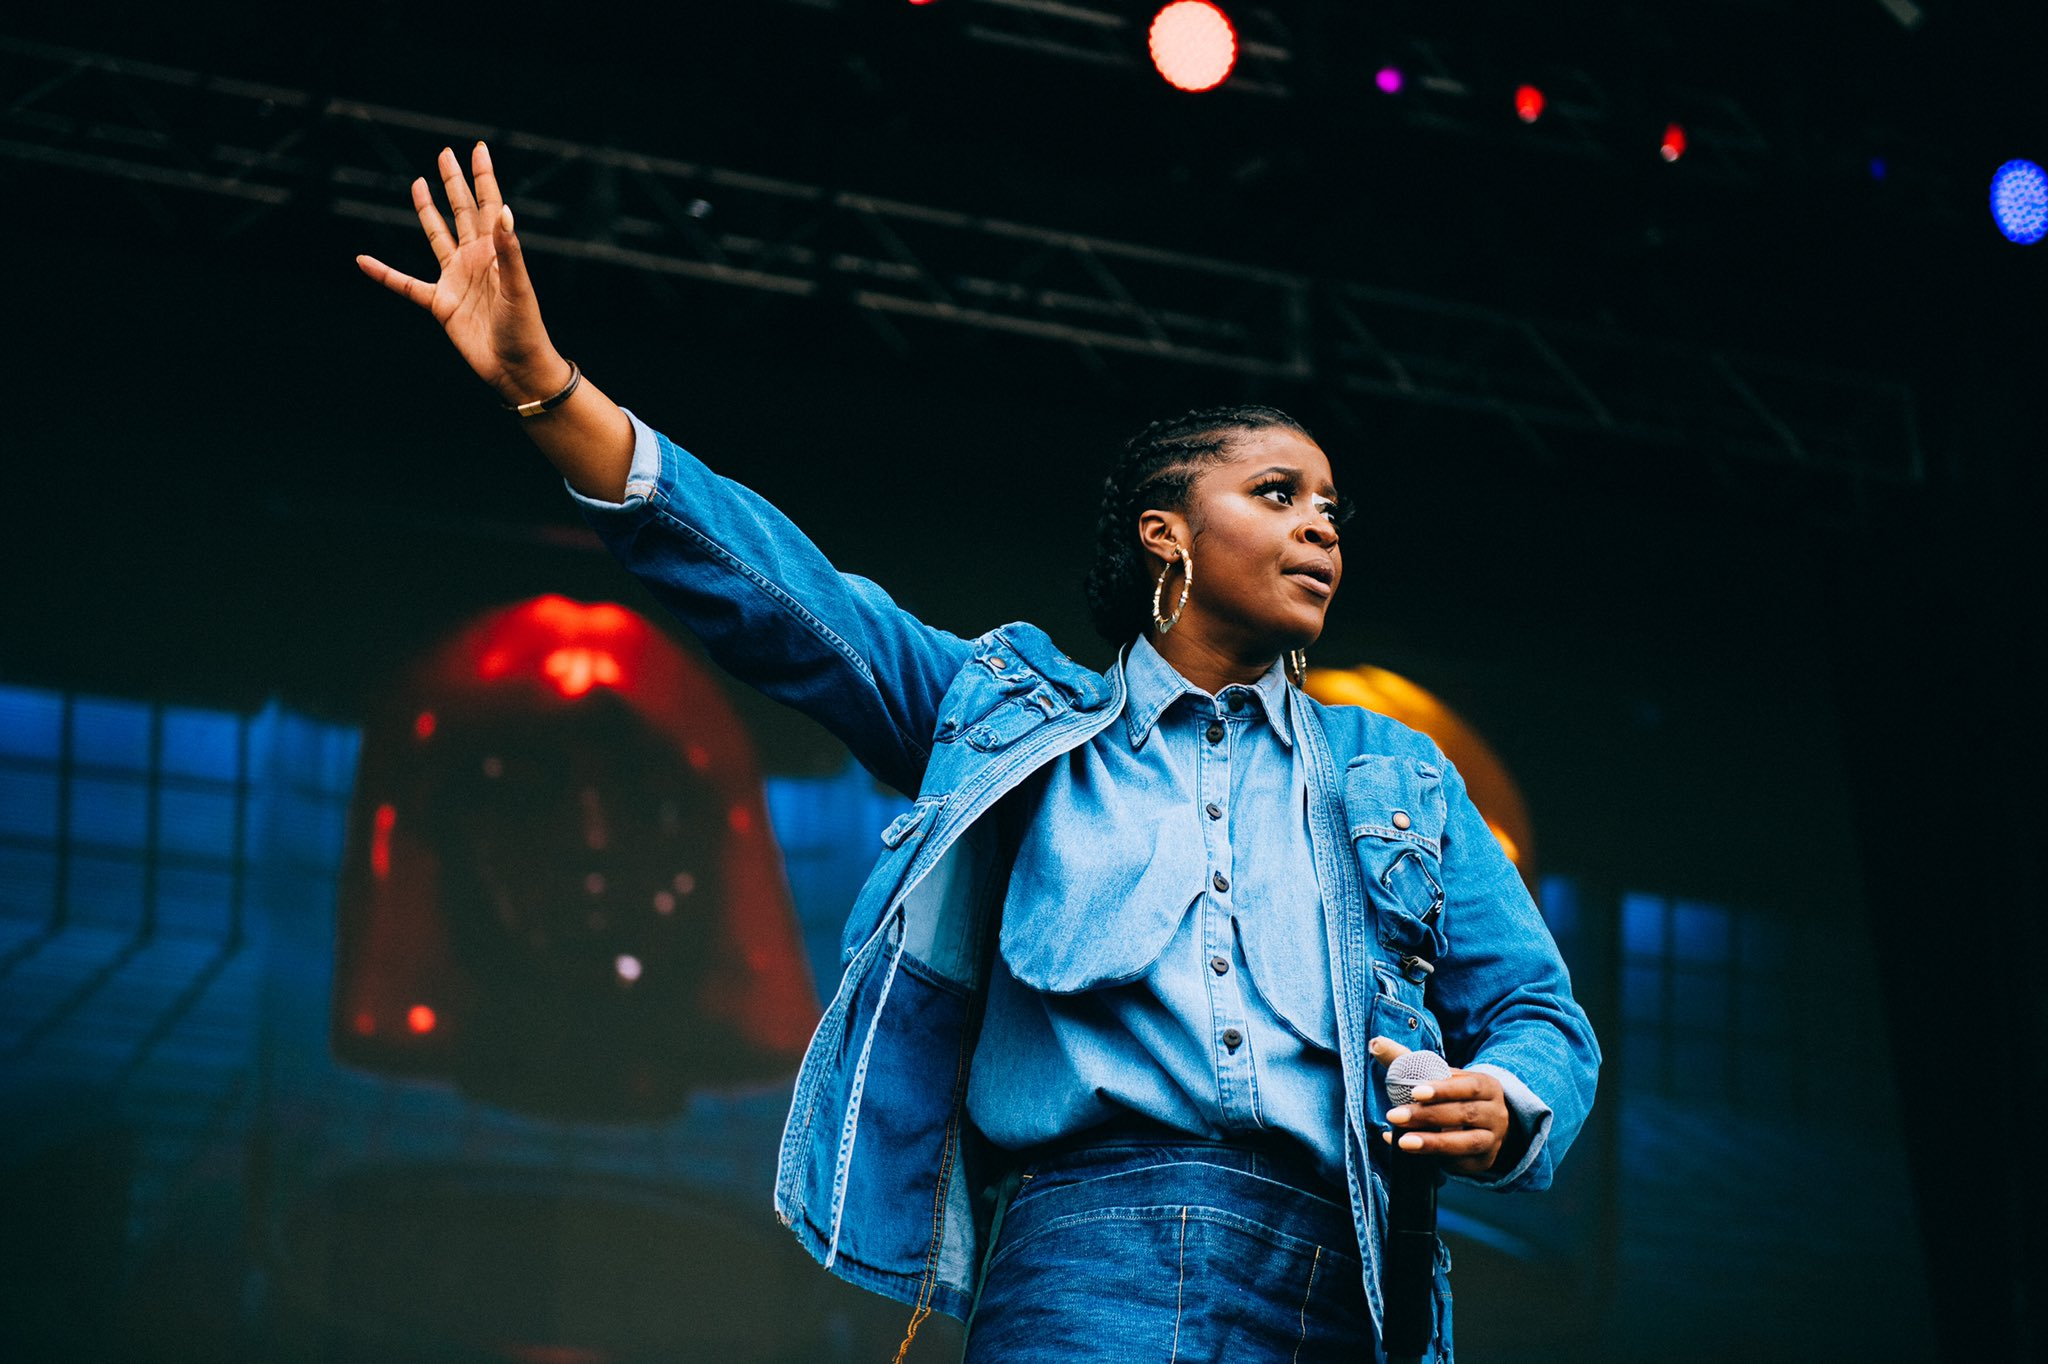 ACL Fest 2019 Photo